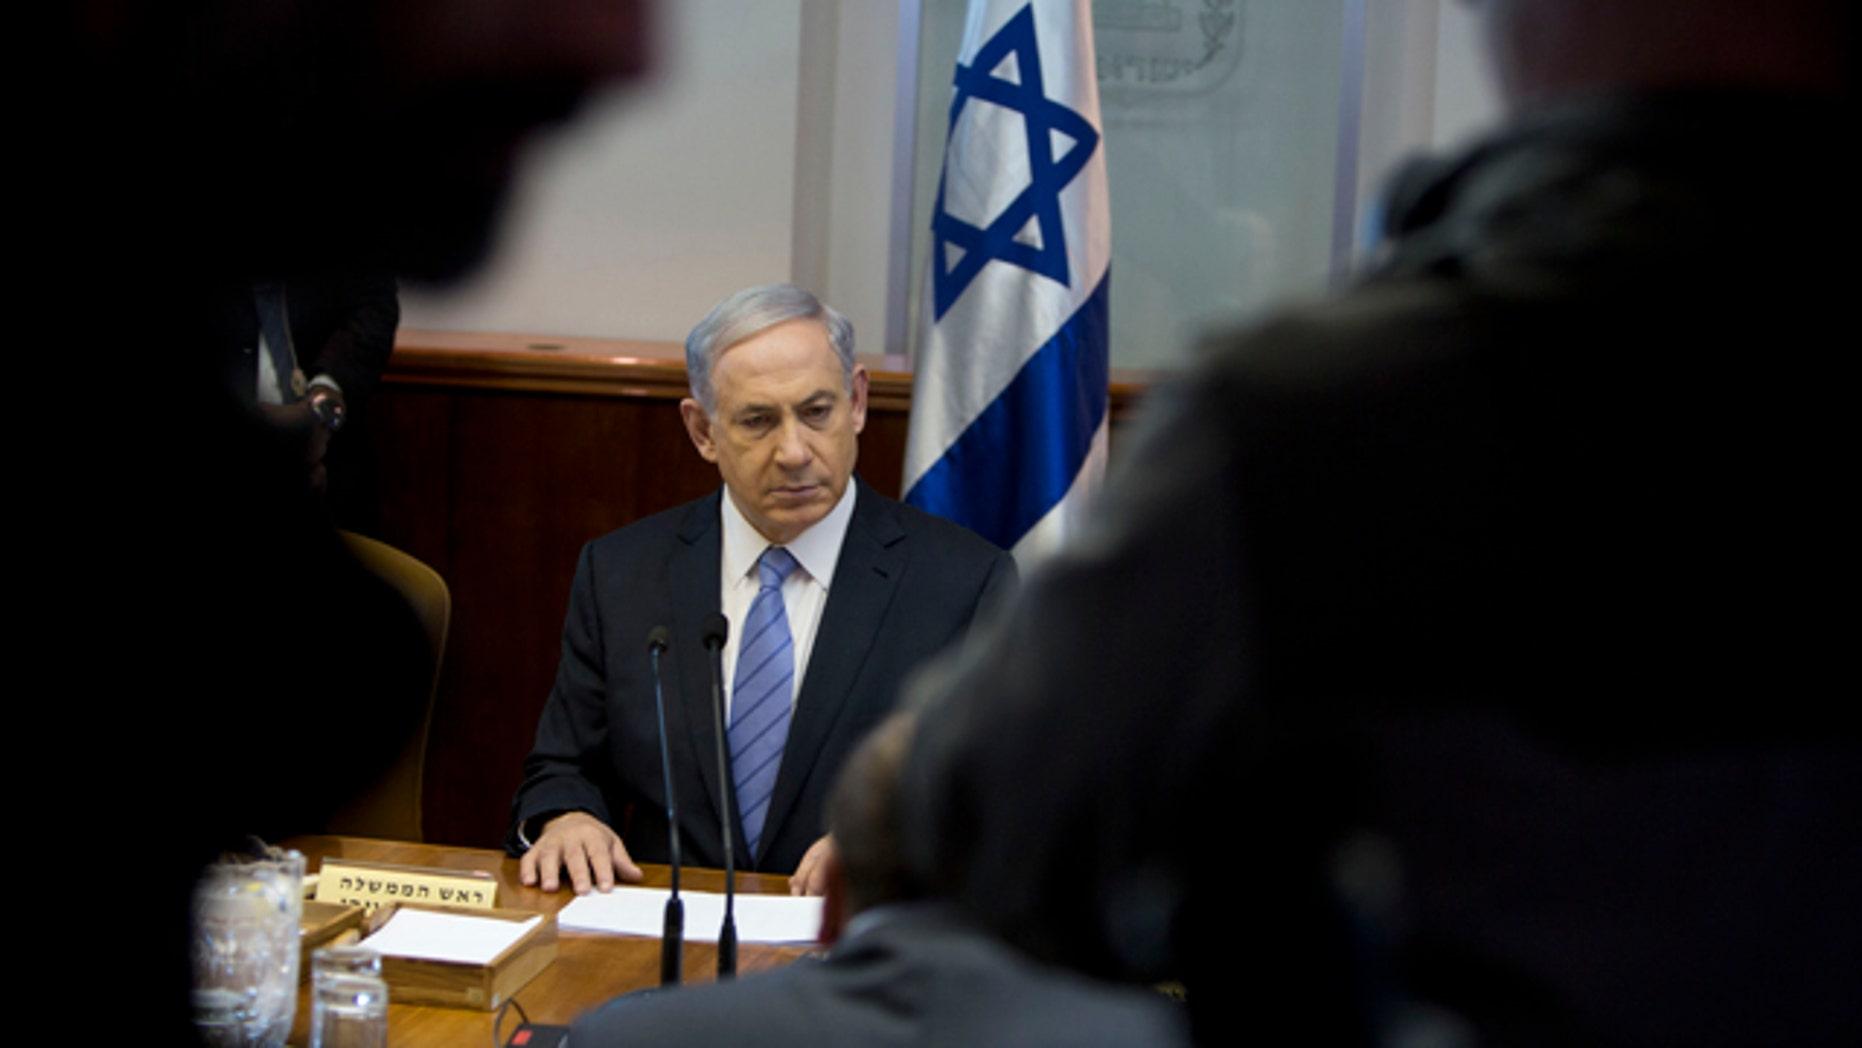 Jan. 4, 2015: Israeli Prime Minister Benjamin Netanyahu attends a weekly cabinet meeting in Jerusalem. (AP Photo/Oded Balilty, Pool)